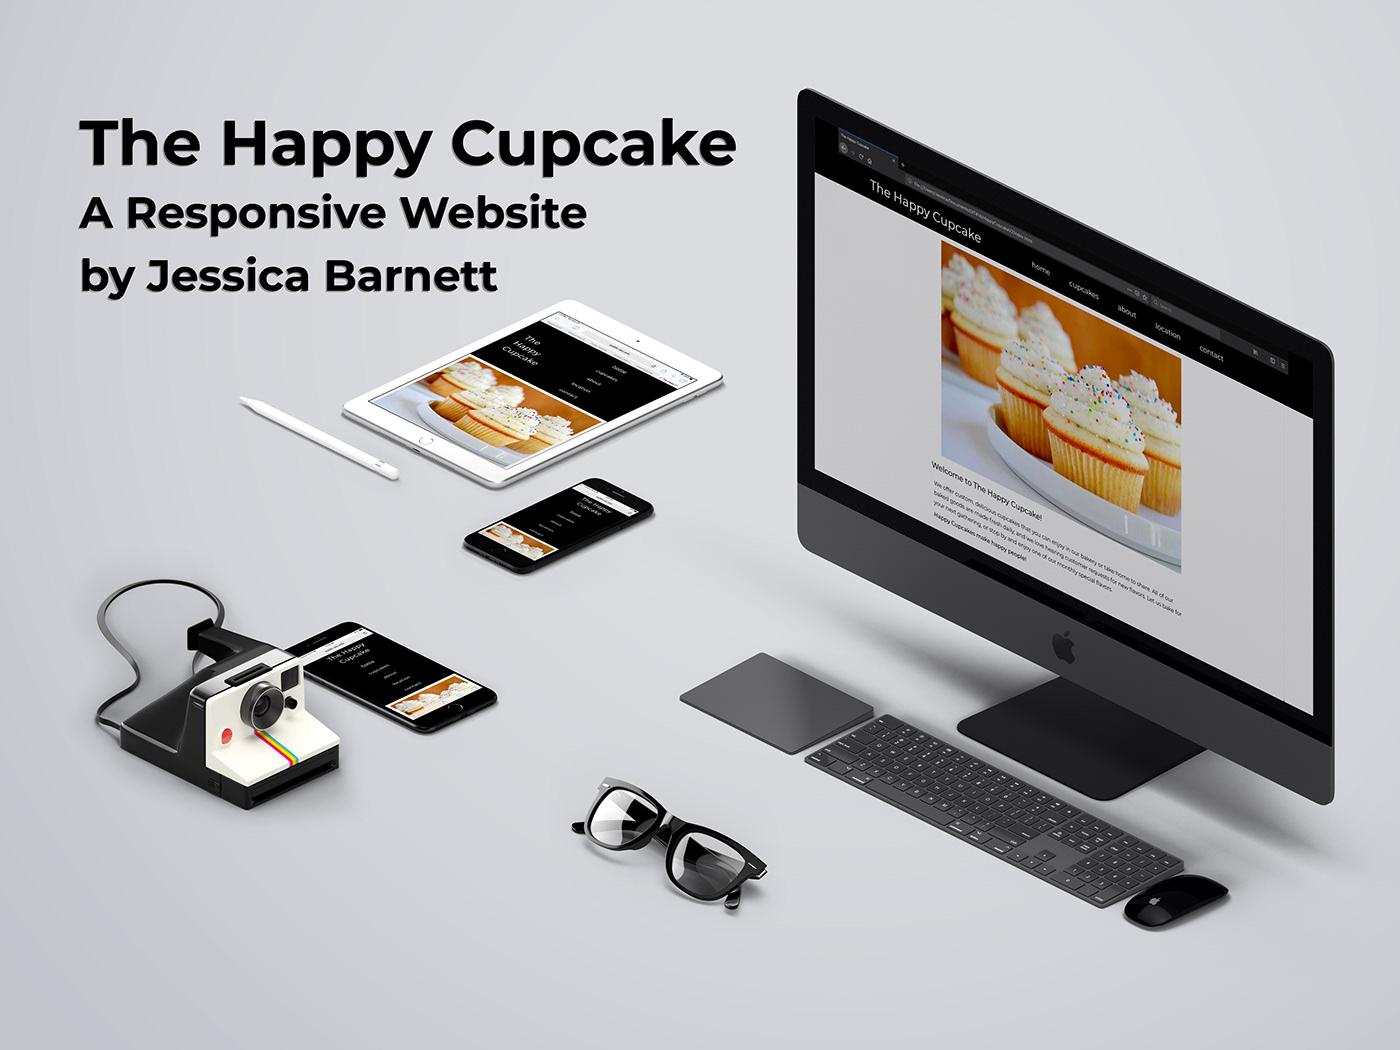 GIT-Awards-F18 HTML css Responsive Design code wireframes mockups Interactive Mockups adobeawards